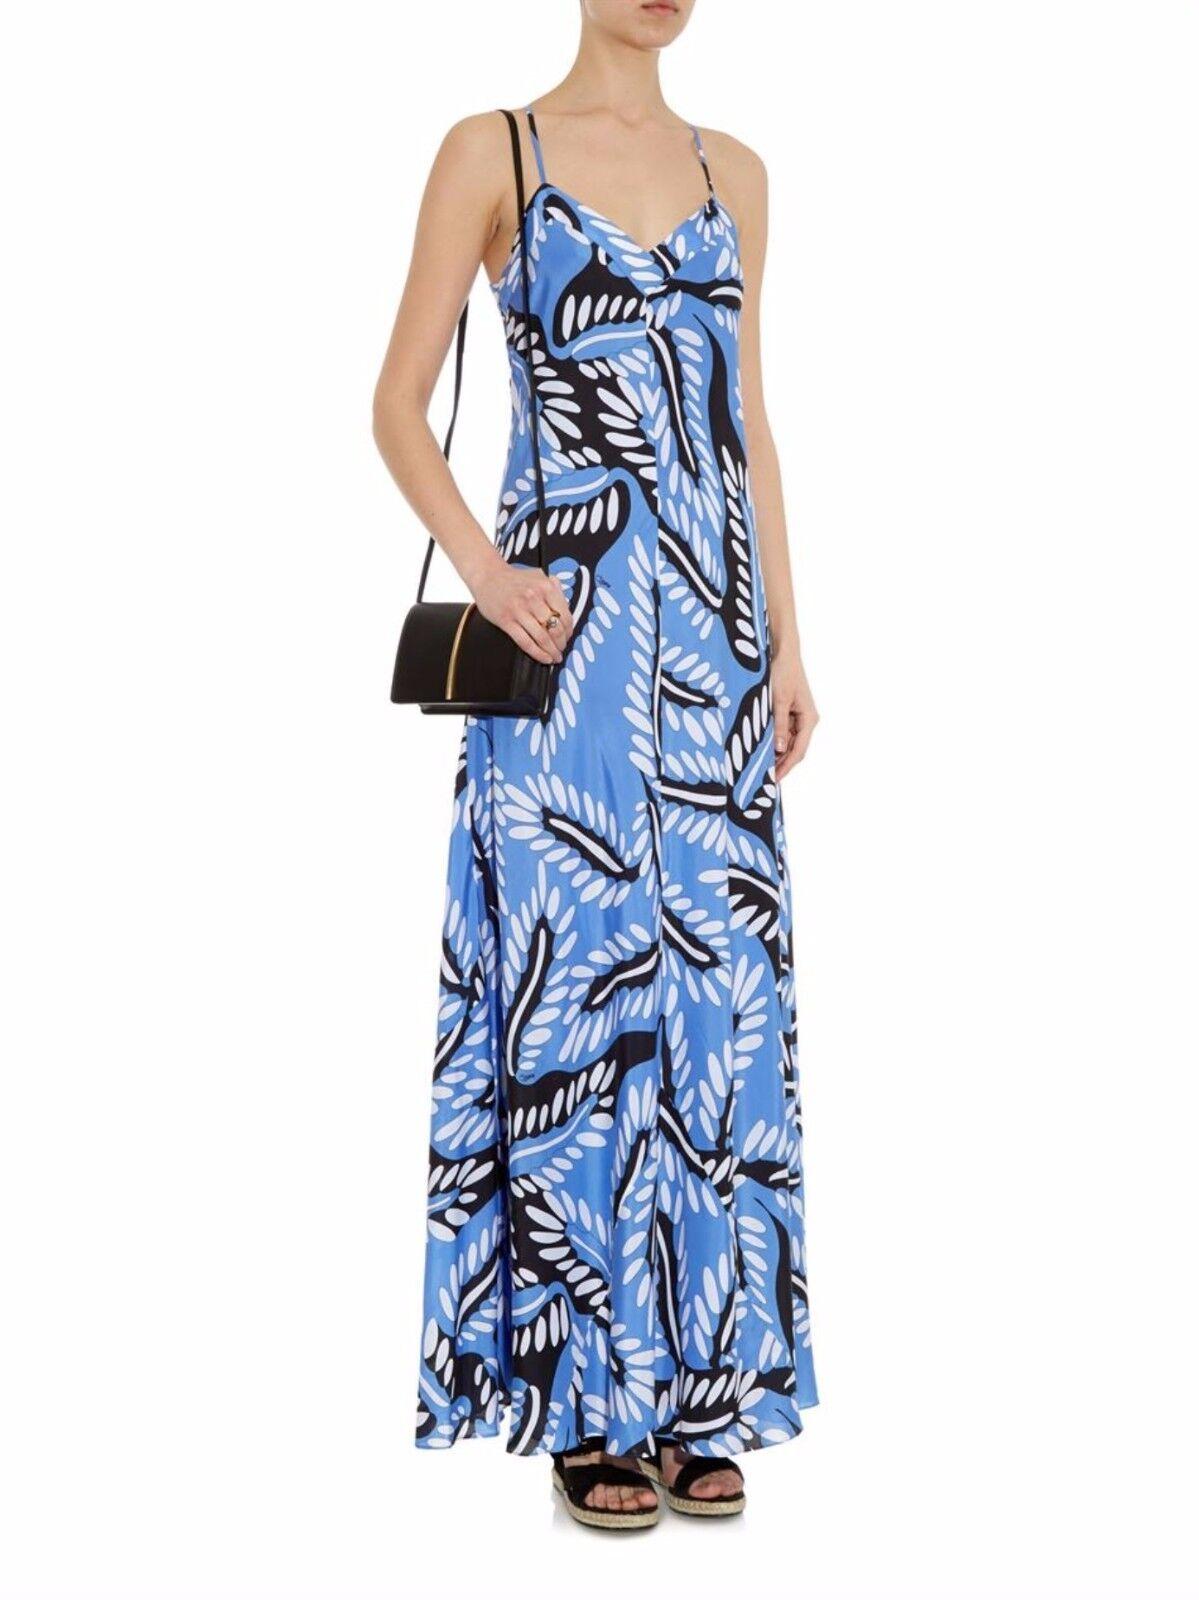 Diane von Furstenberg Riveria Buds Print Maxi Dress, Multi-color SIZE 8  v